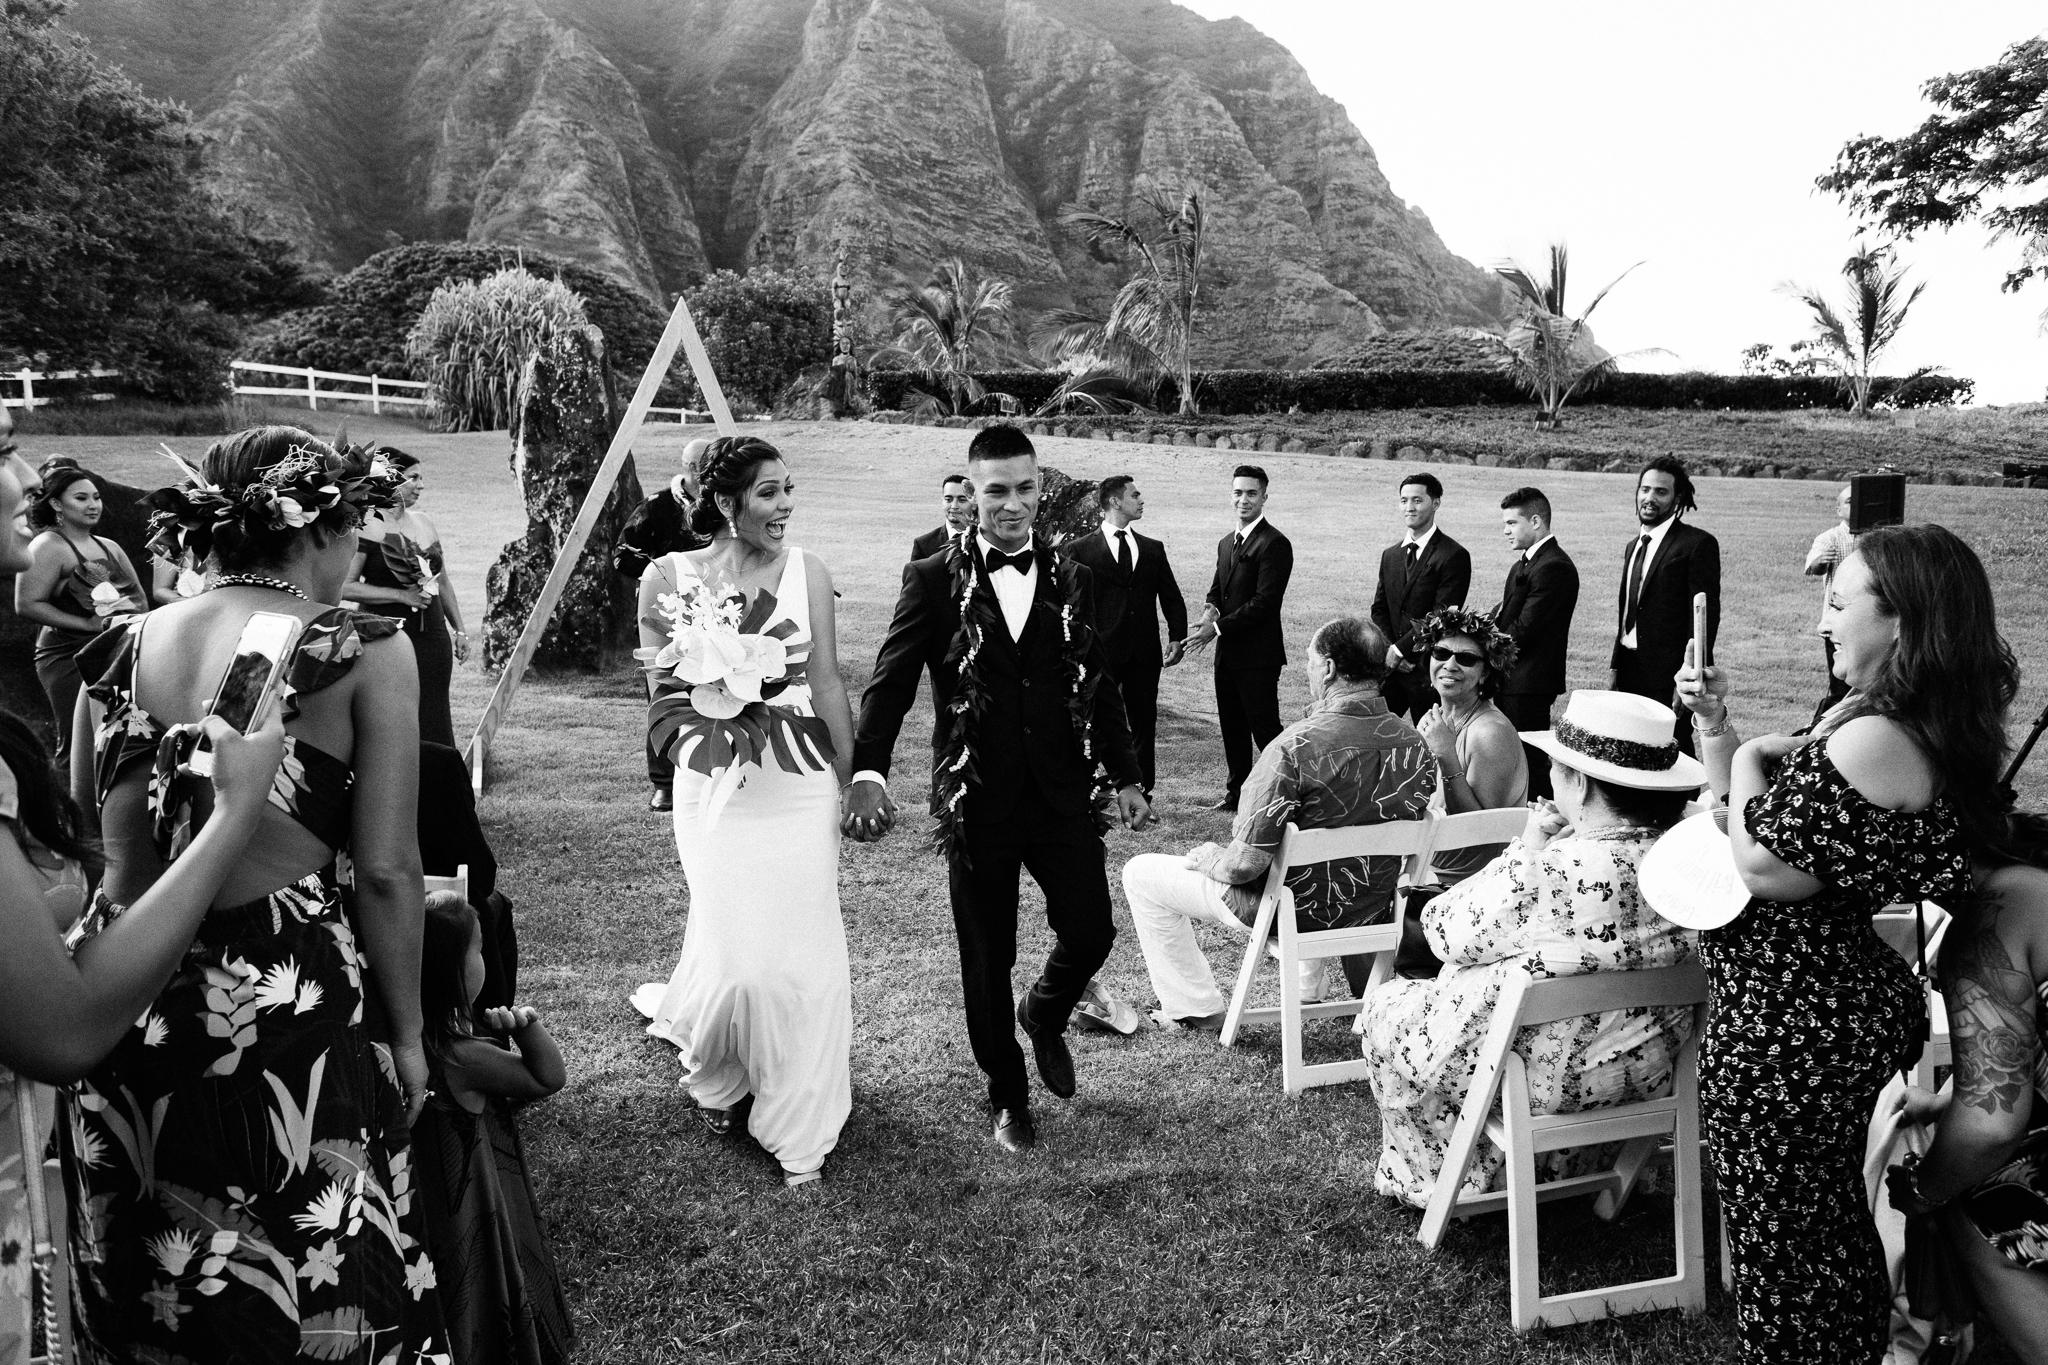 Kualoa_Ranch_Wedding_Photographer_Tone_Hawaii-25.jpg